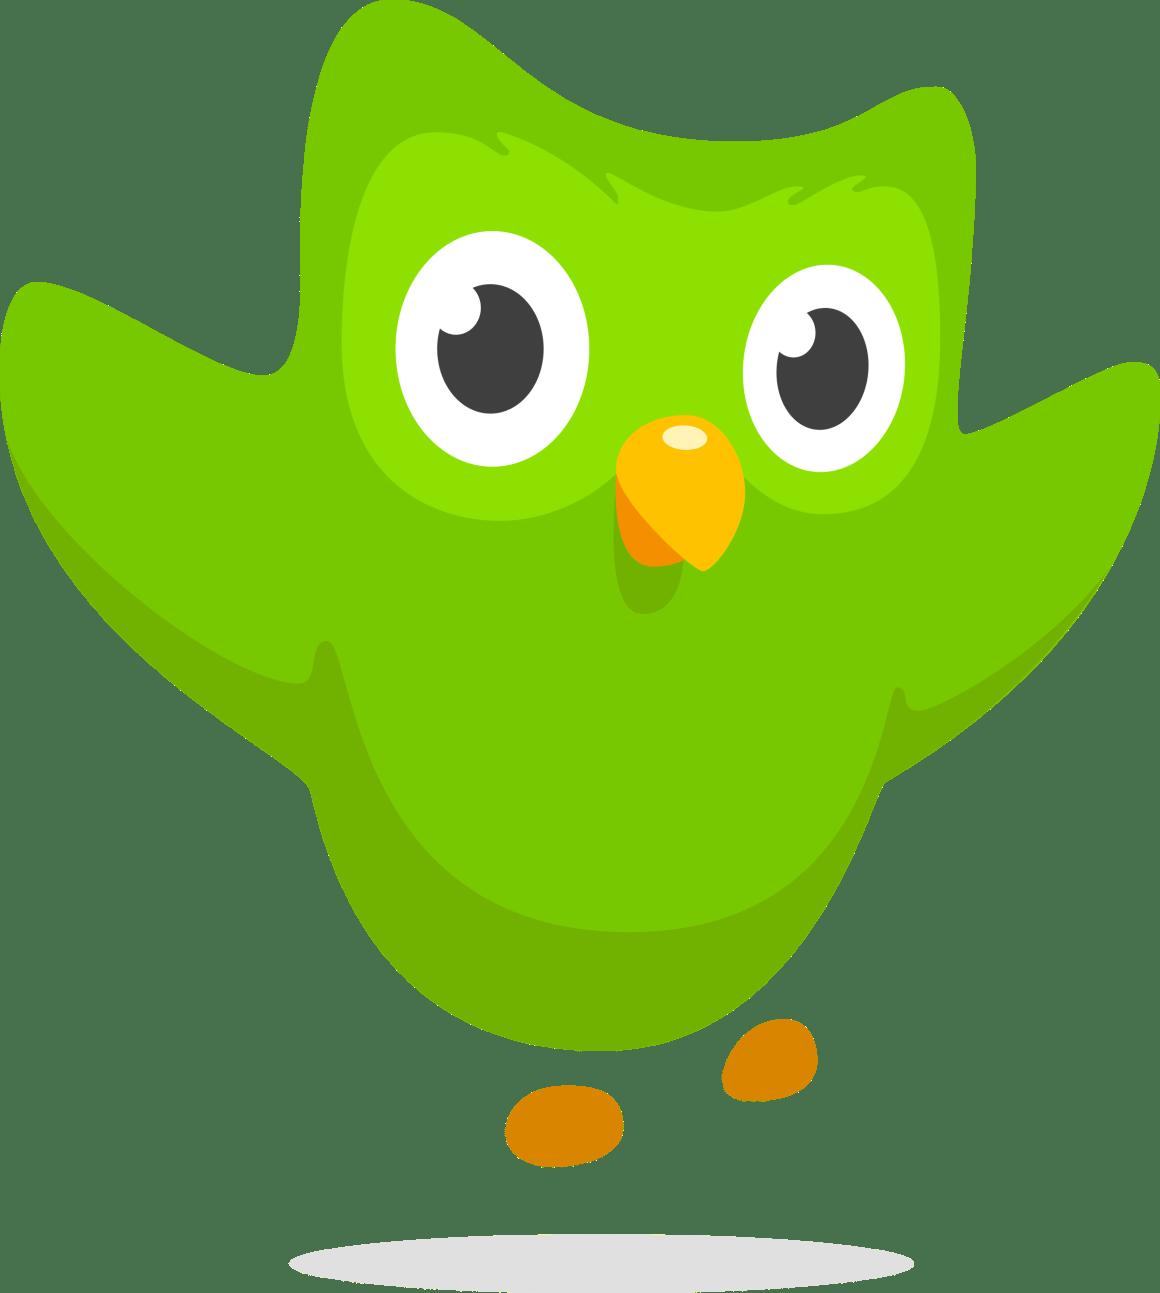 Best free learning apps for kids: Duolingo